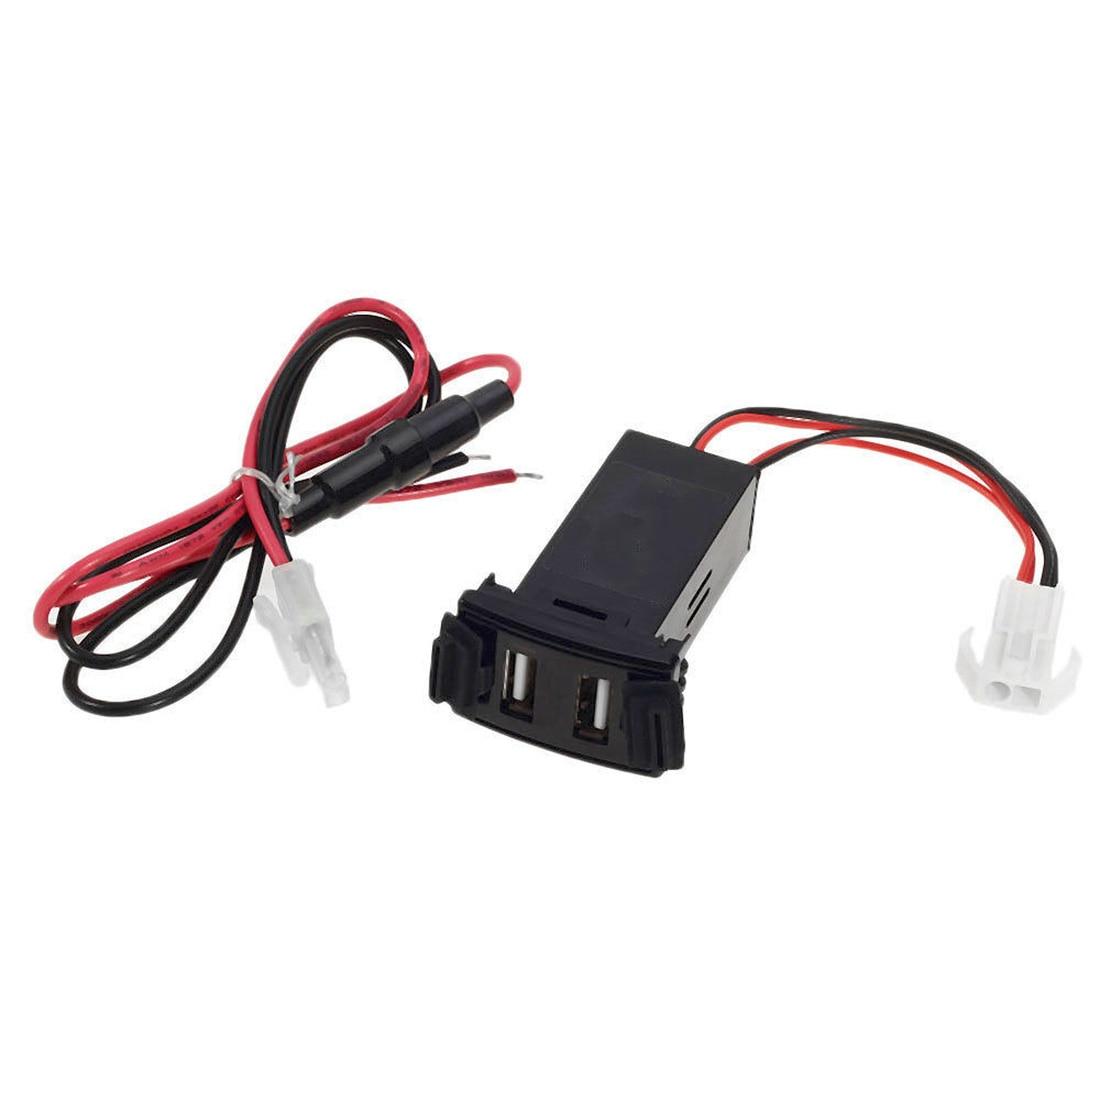 Car 2.1A Dual USB Port Socket Cell Phone Charger + Audio Input For Mazda tipos de entradas usb para celulares